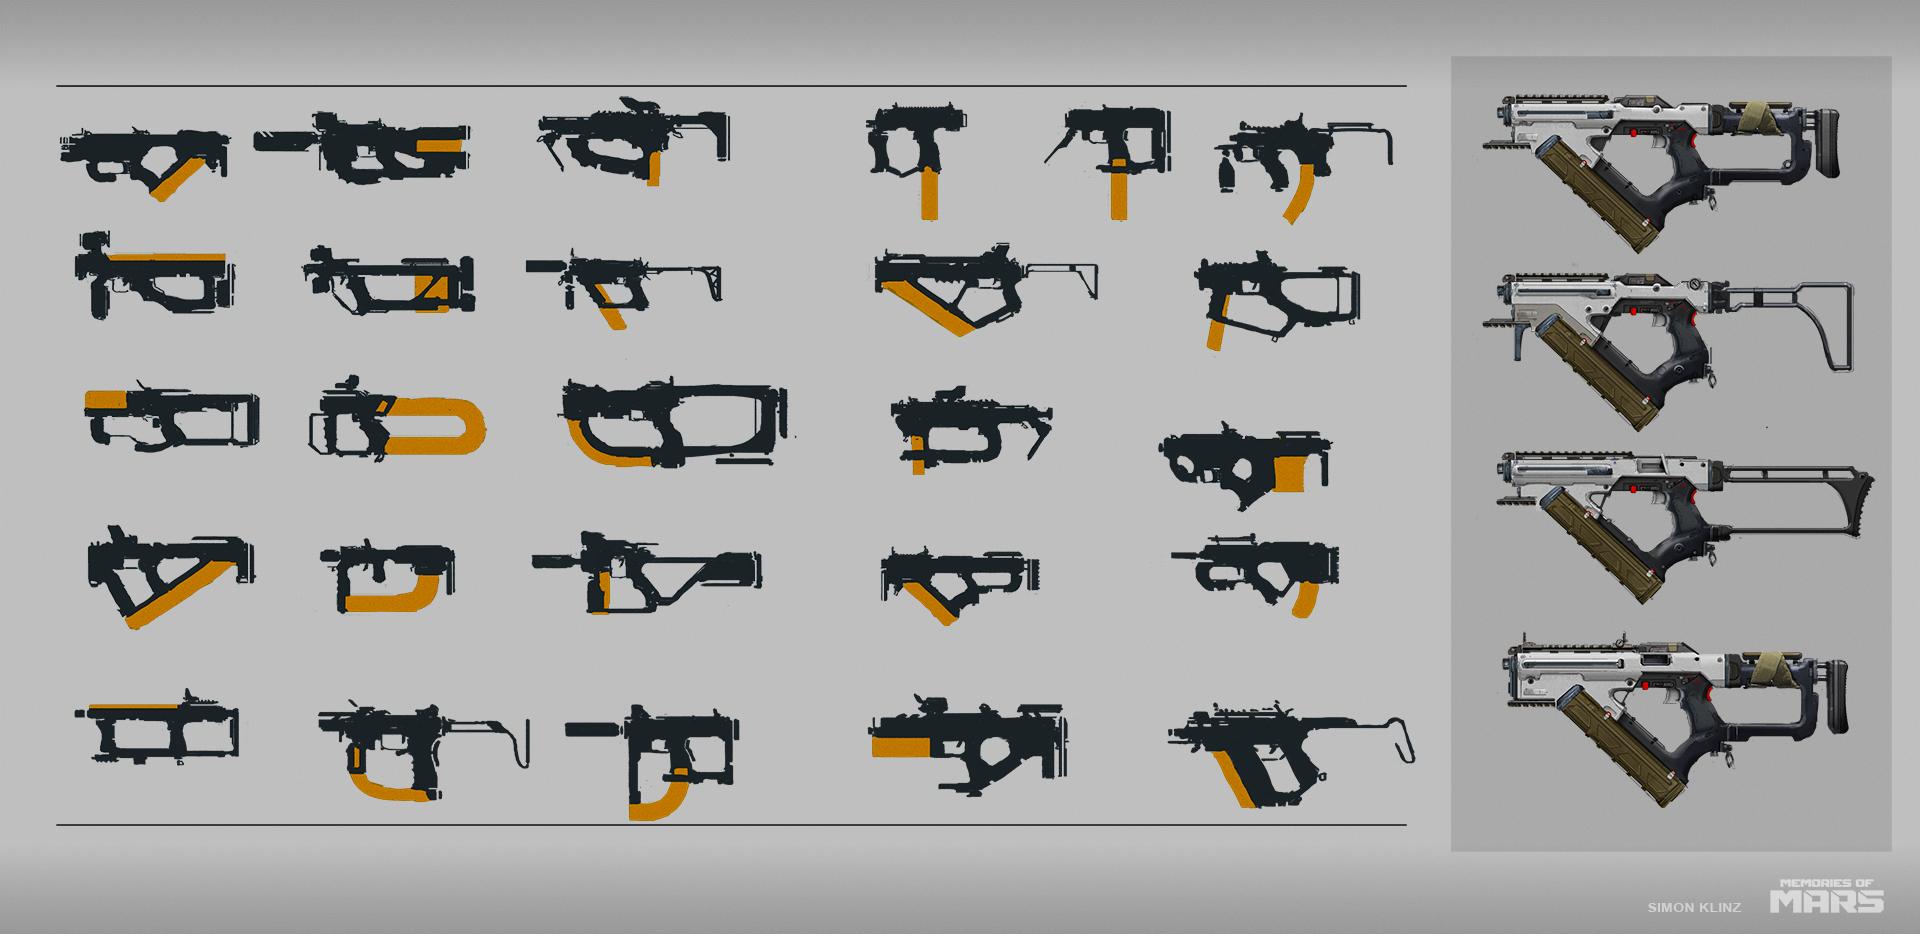 Submachine gun concepts.